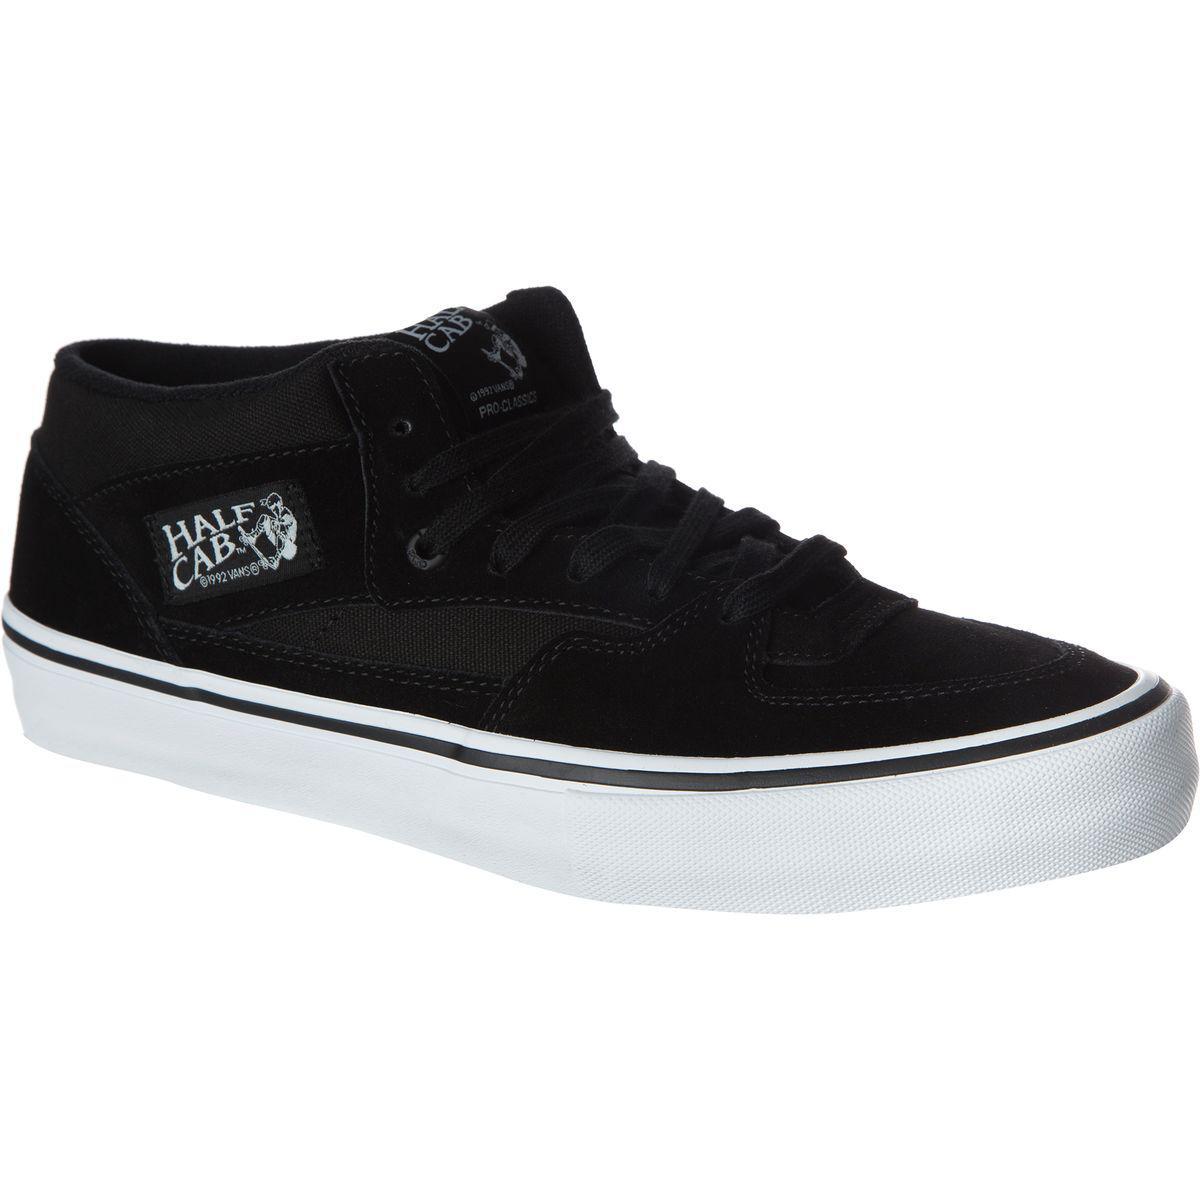 9f9e0337a6 Vans - Black Half Cab Pro Skate Shoe for Men - Lyst. View fullscreen